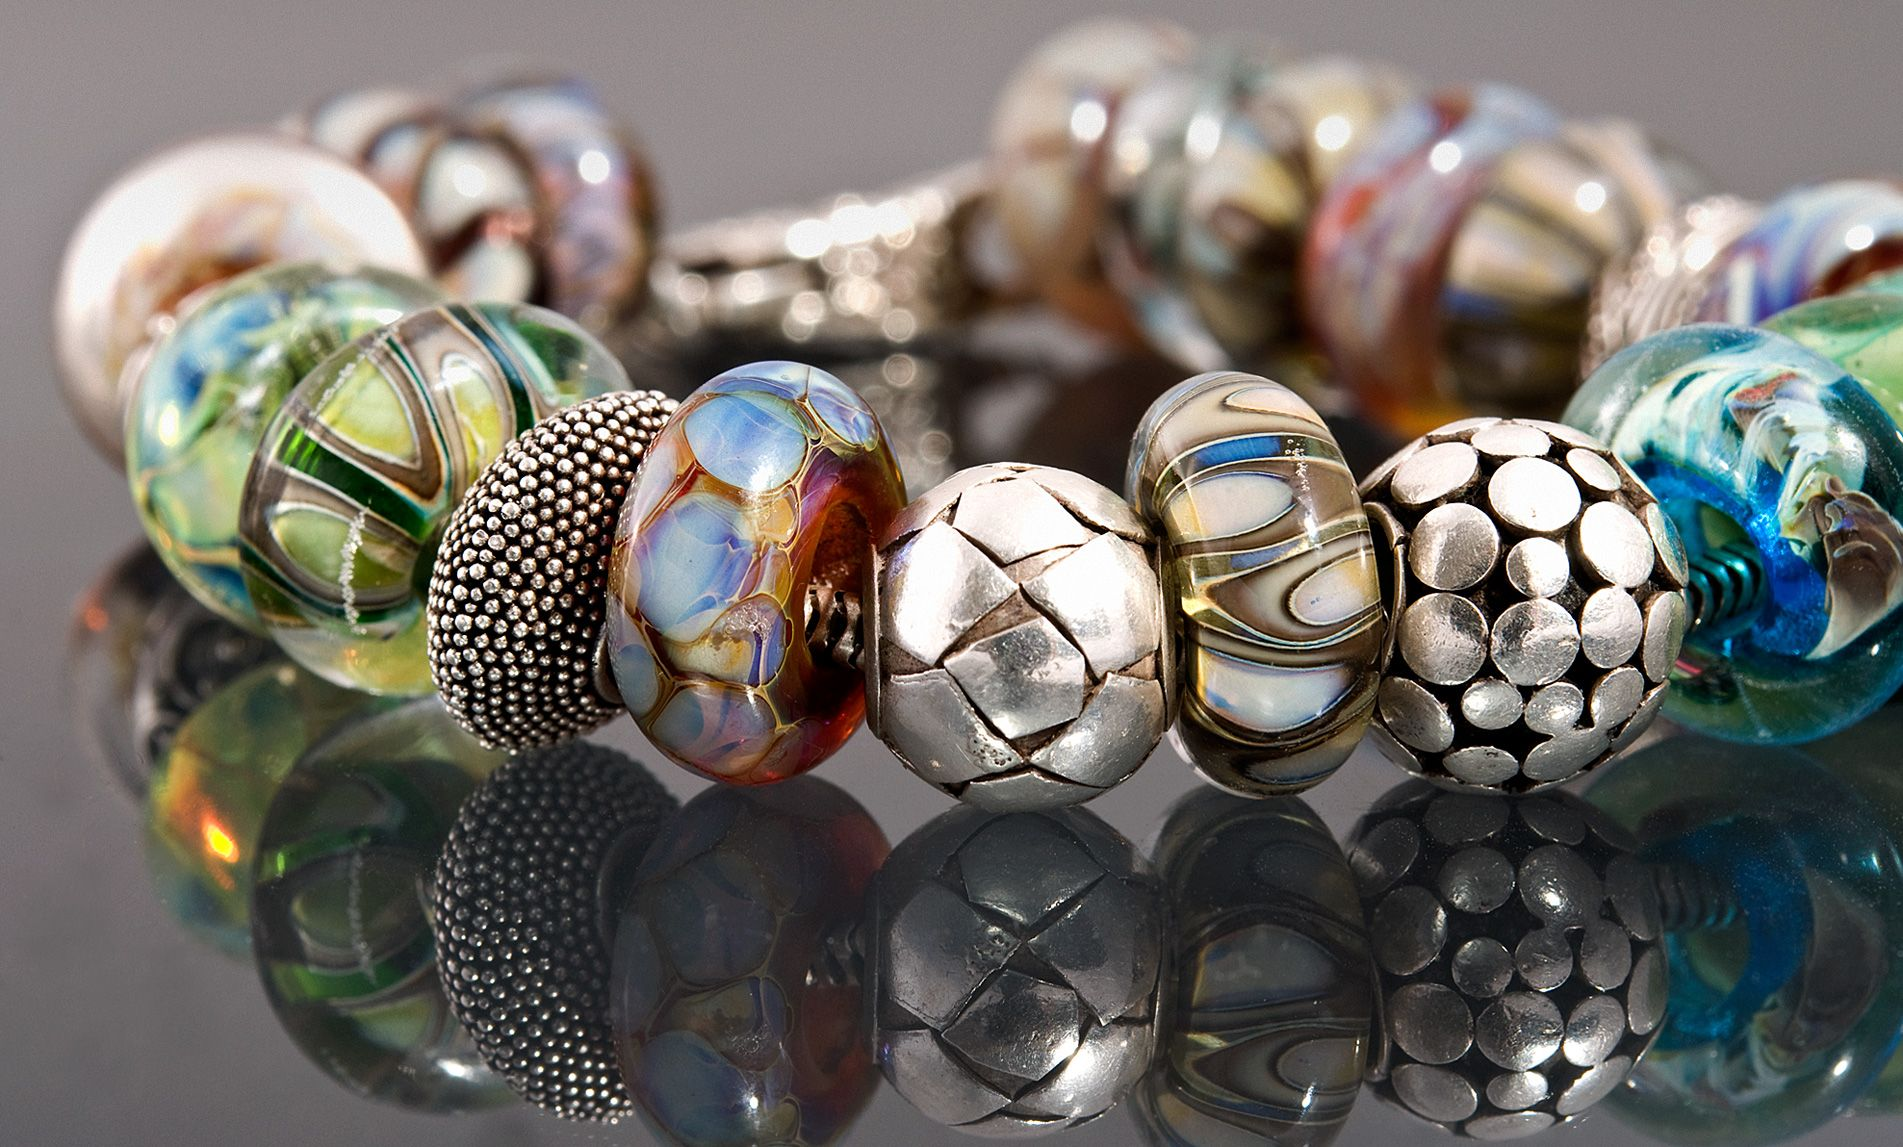 Glitzerglas - Glasperlen - Pandora / Trollbeads Style Muranoglasperlen